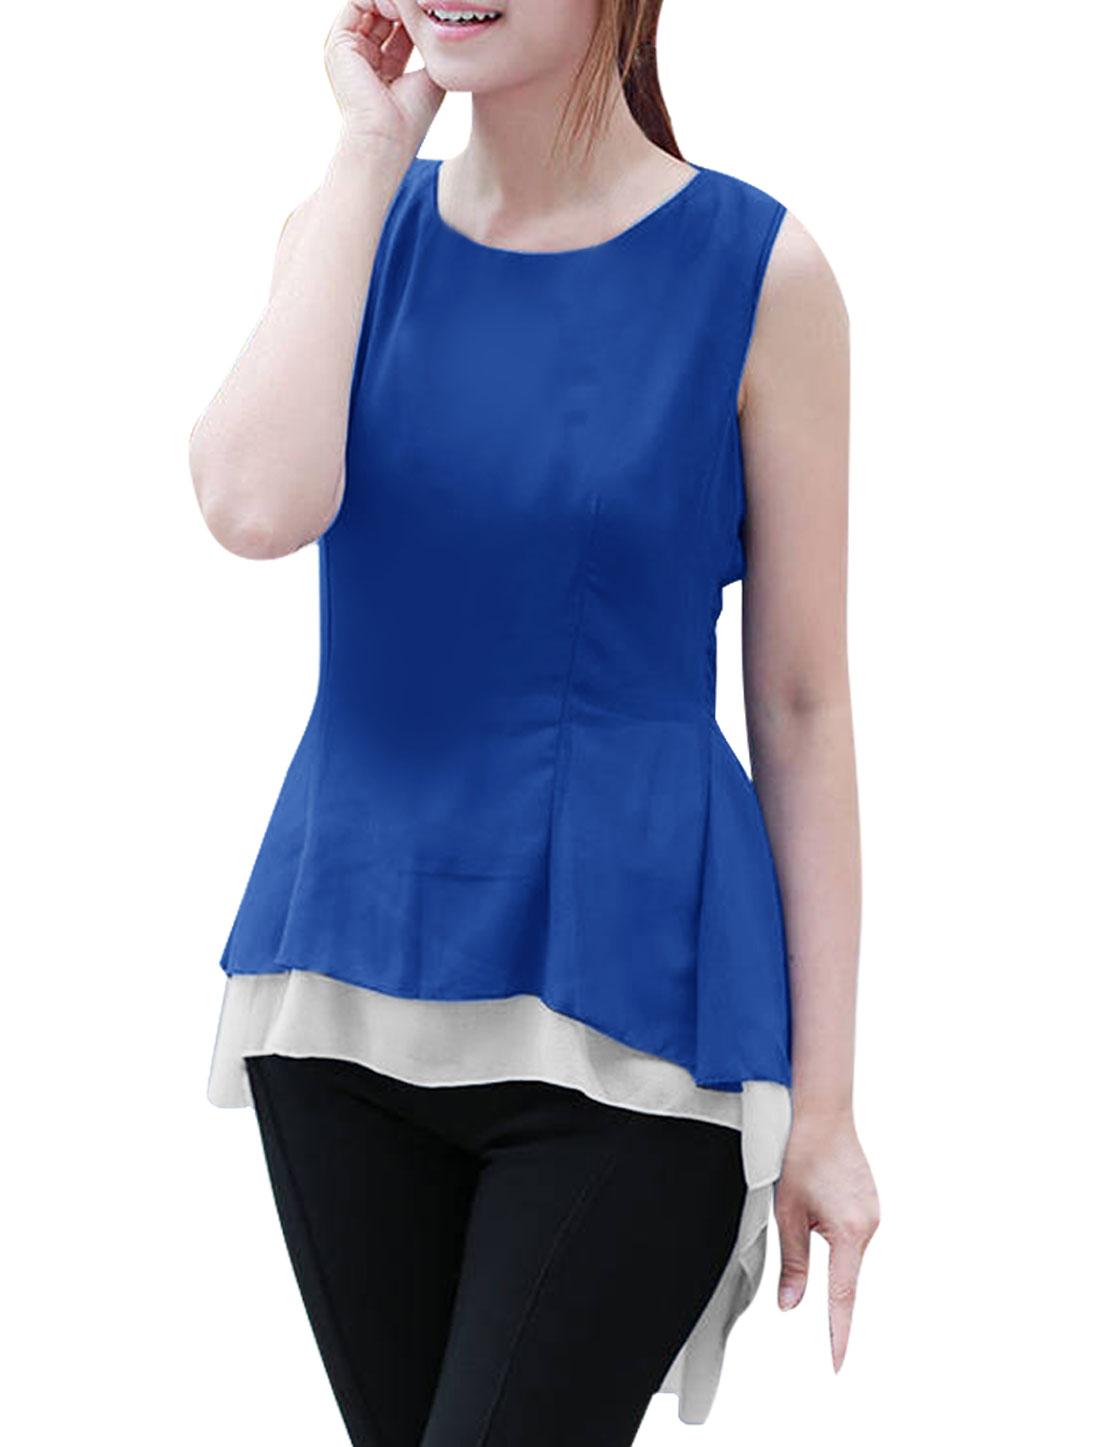 Woman Round Neck Sleeveless Low-High Hem Royalblue White Peplum Tops XS